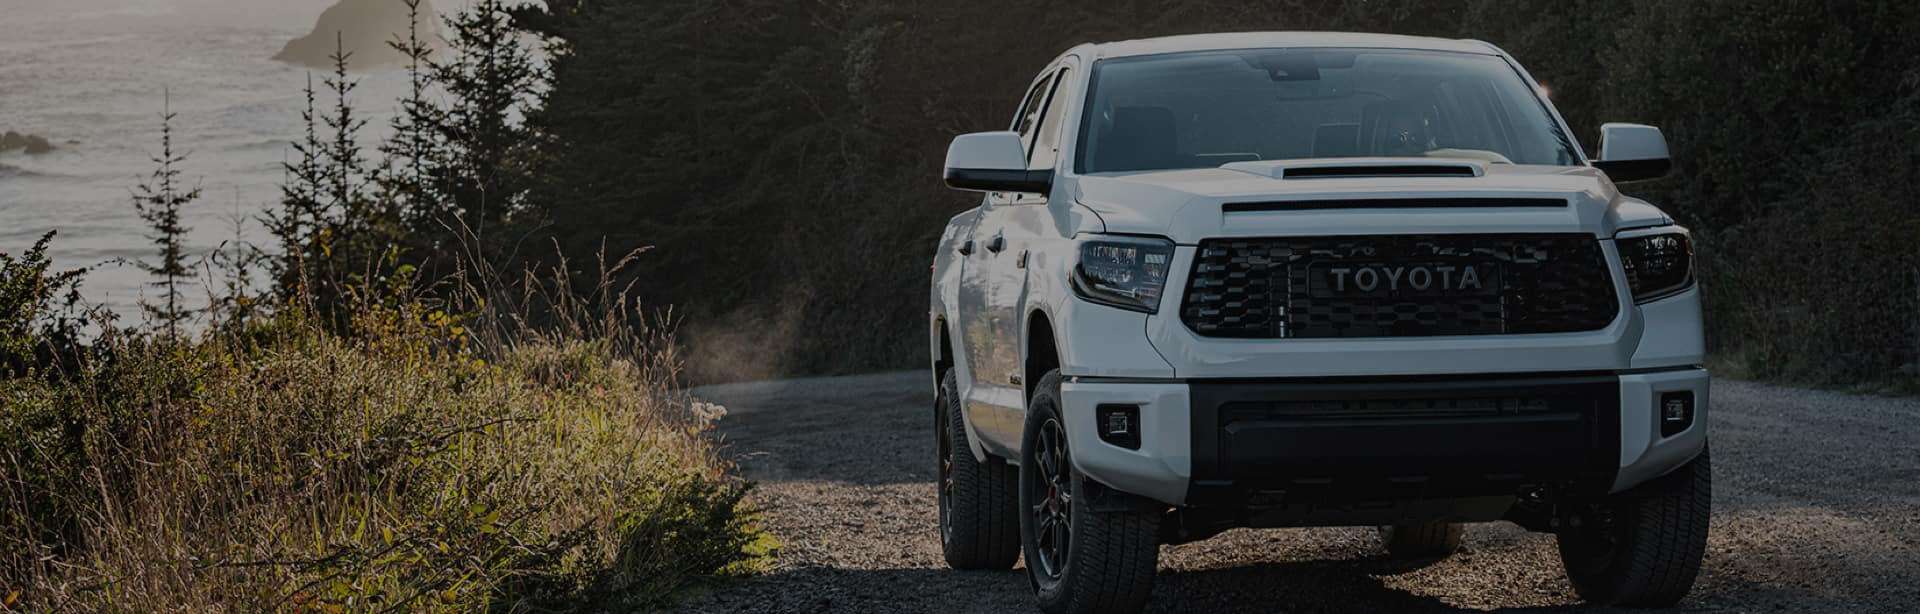 White Tooyoota Pickup Truck on Mountain Road